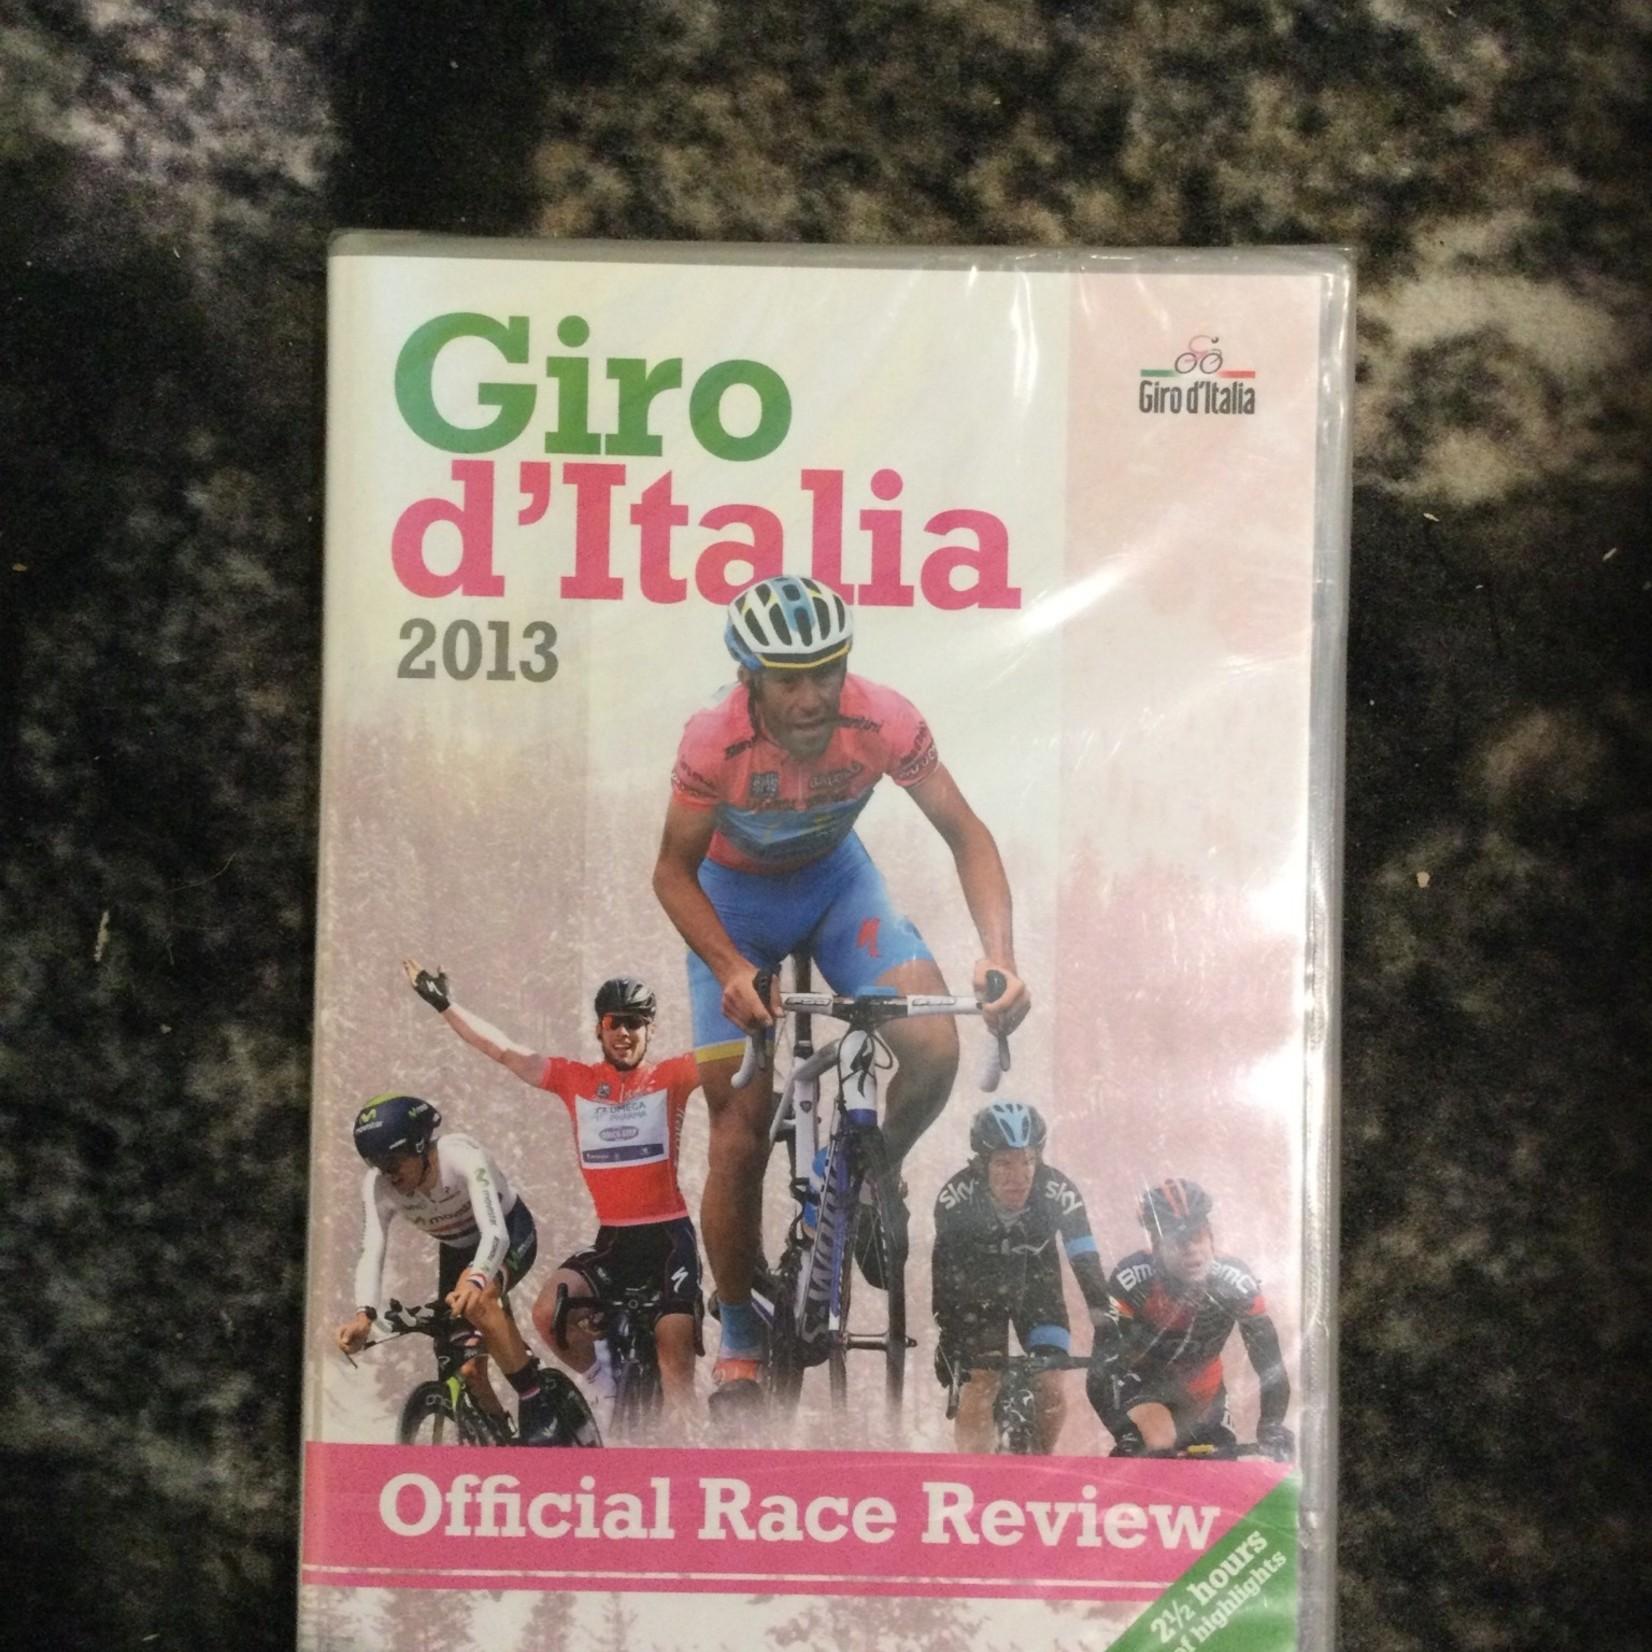 DVD 'Giro d' ltalia'